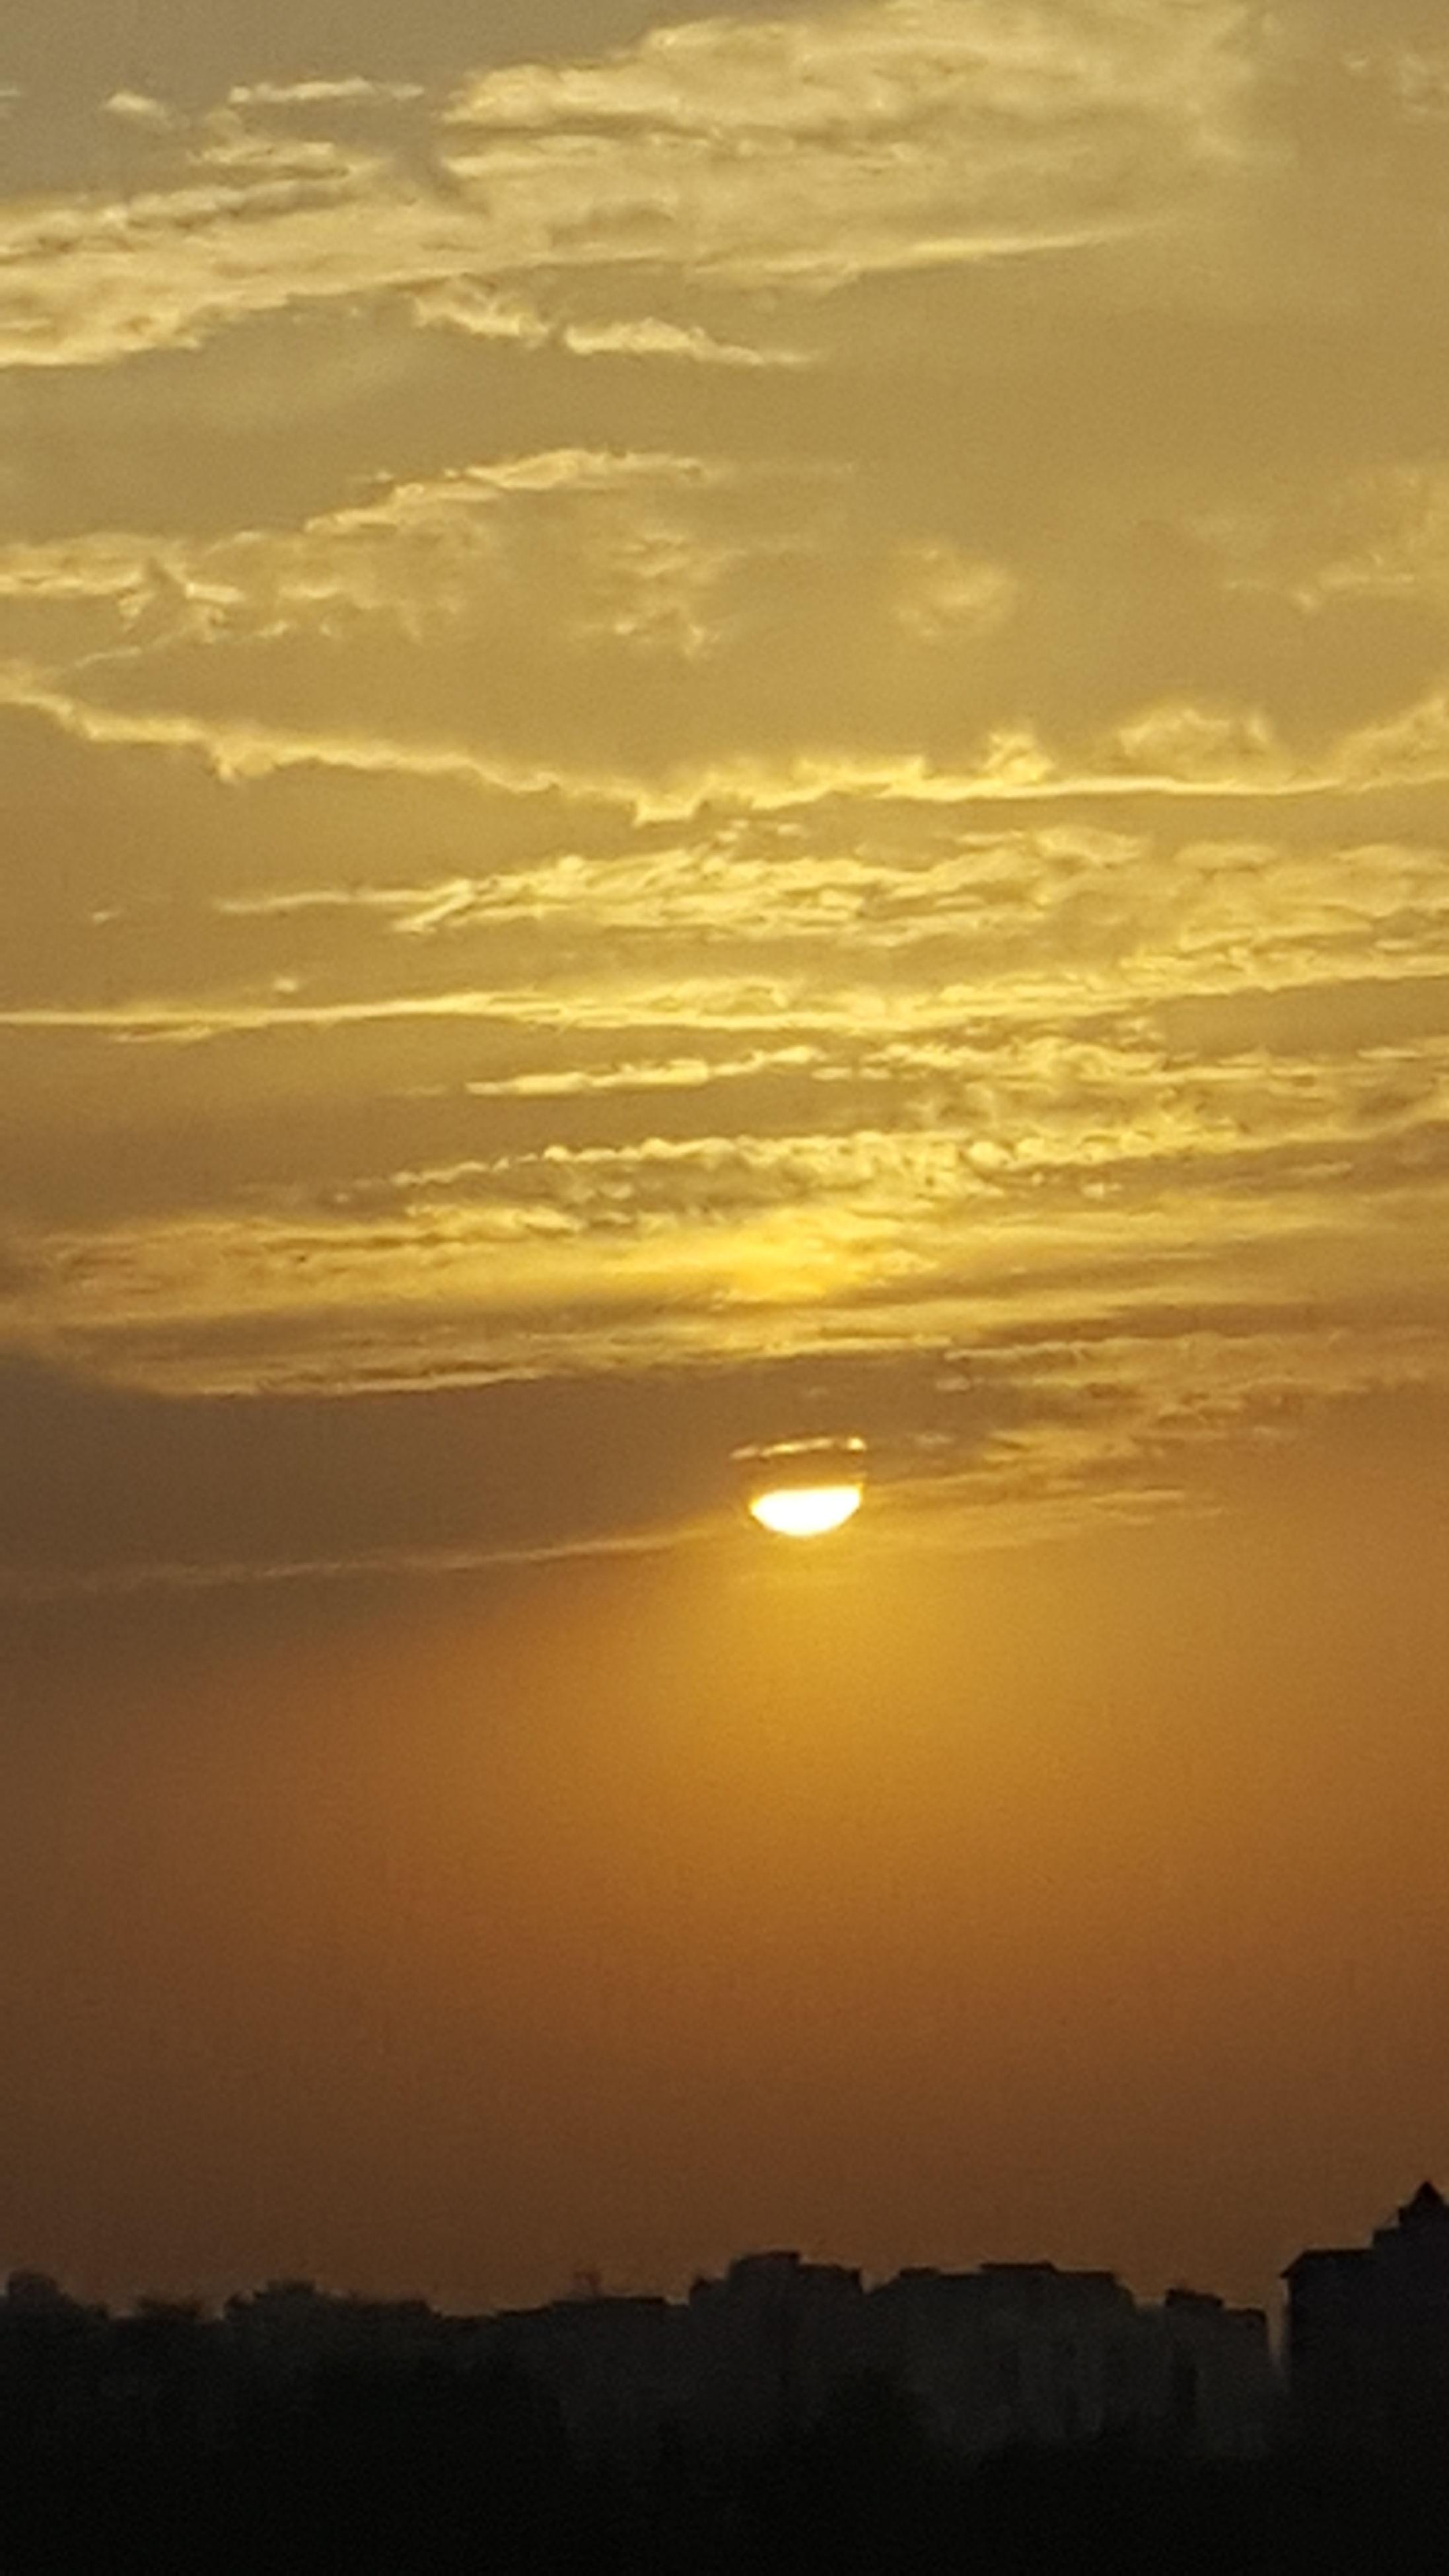 sunset, scenics, tranquil scene, tranquility, sea, beauty in nature, water, sky, nature, idyllic, silhouette, sun, horizon over water, beach, mountain, orange color, reflection, majestic, non-urban scene, outdoors